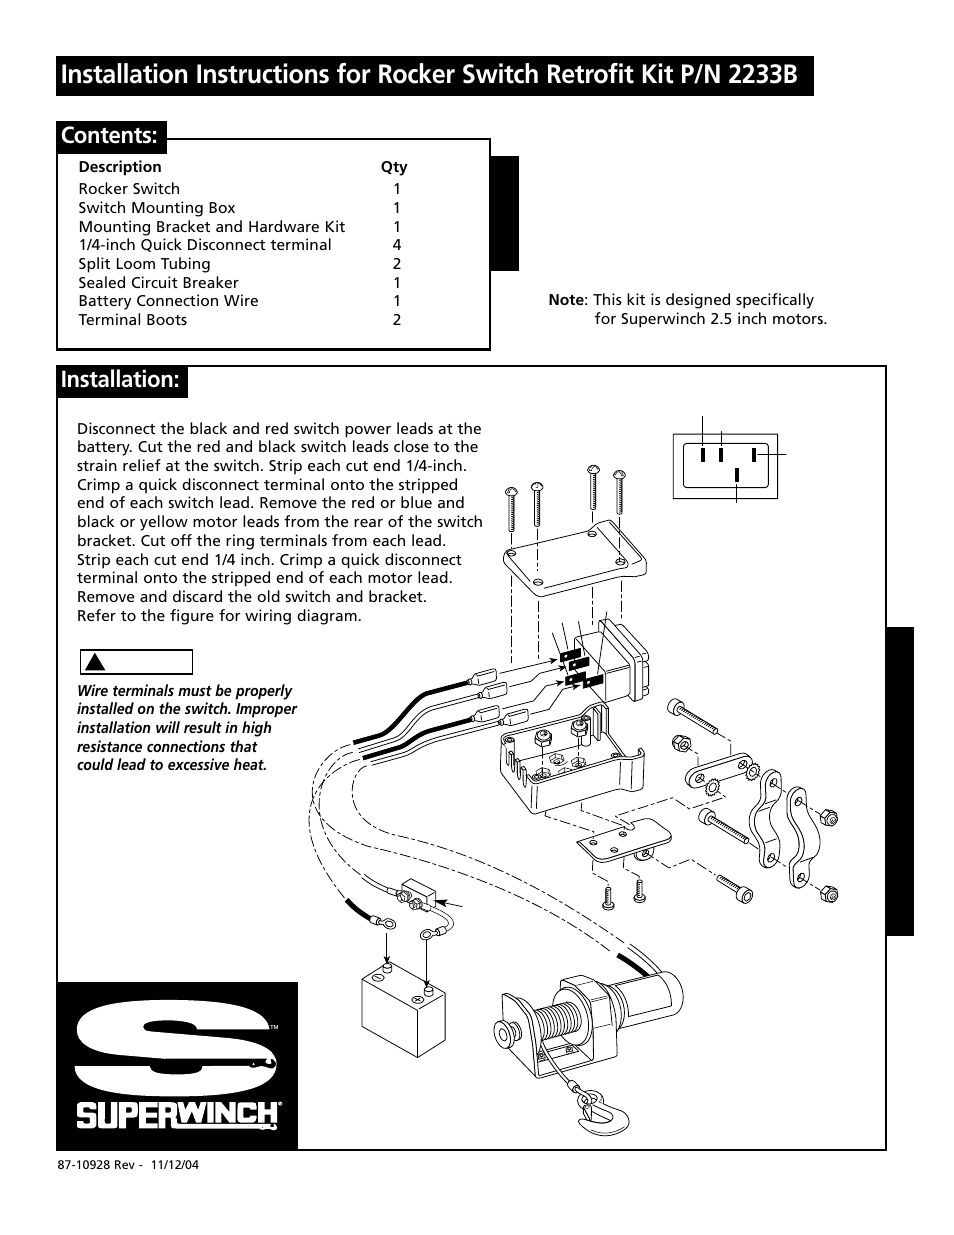 wiring diagram also tuff stuff winch on tuff stuff